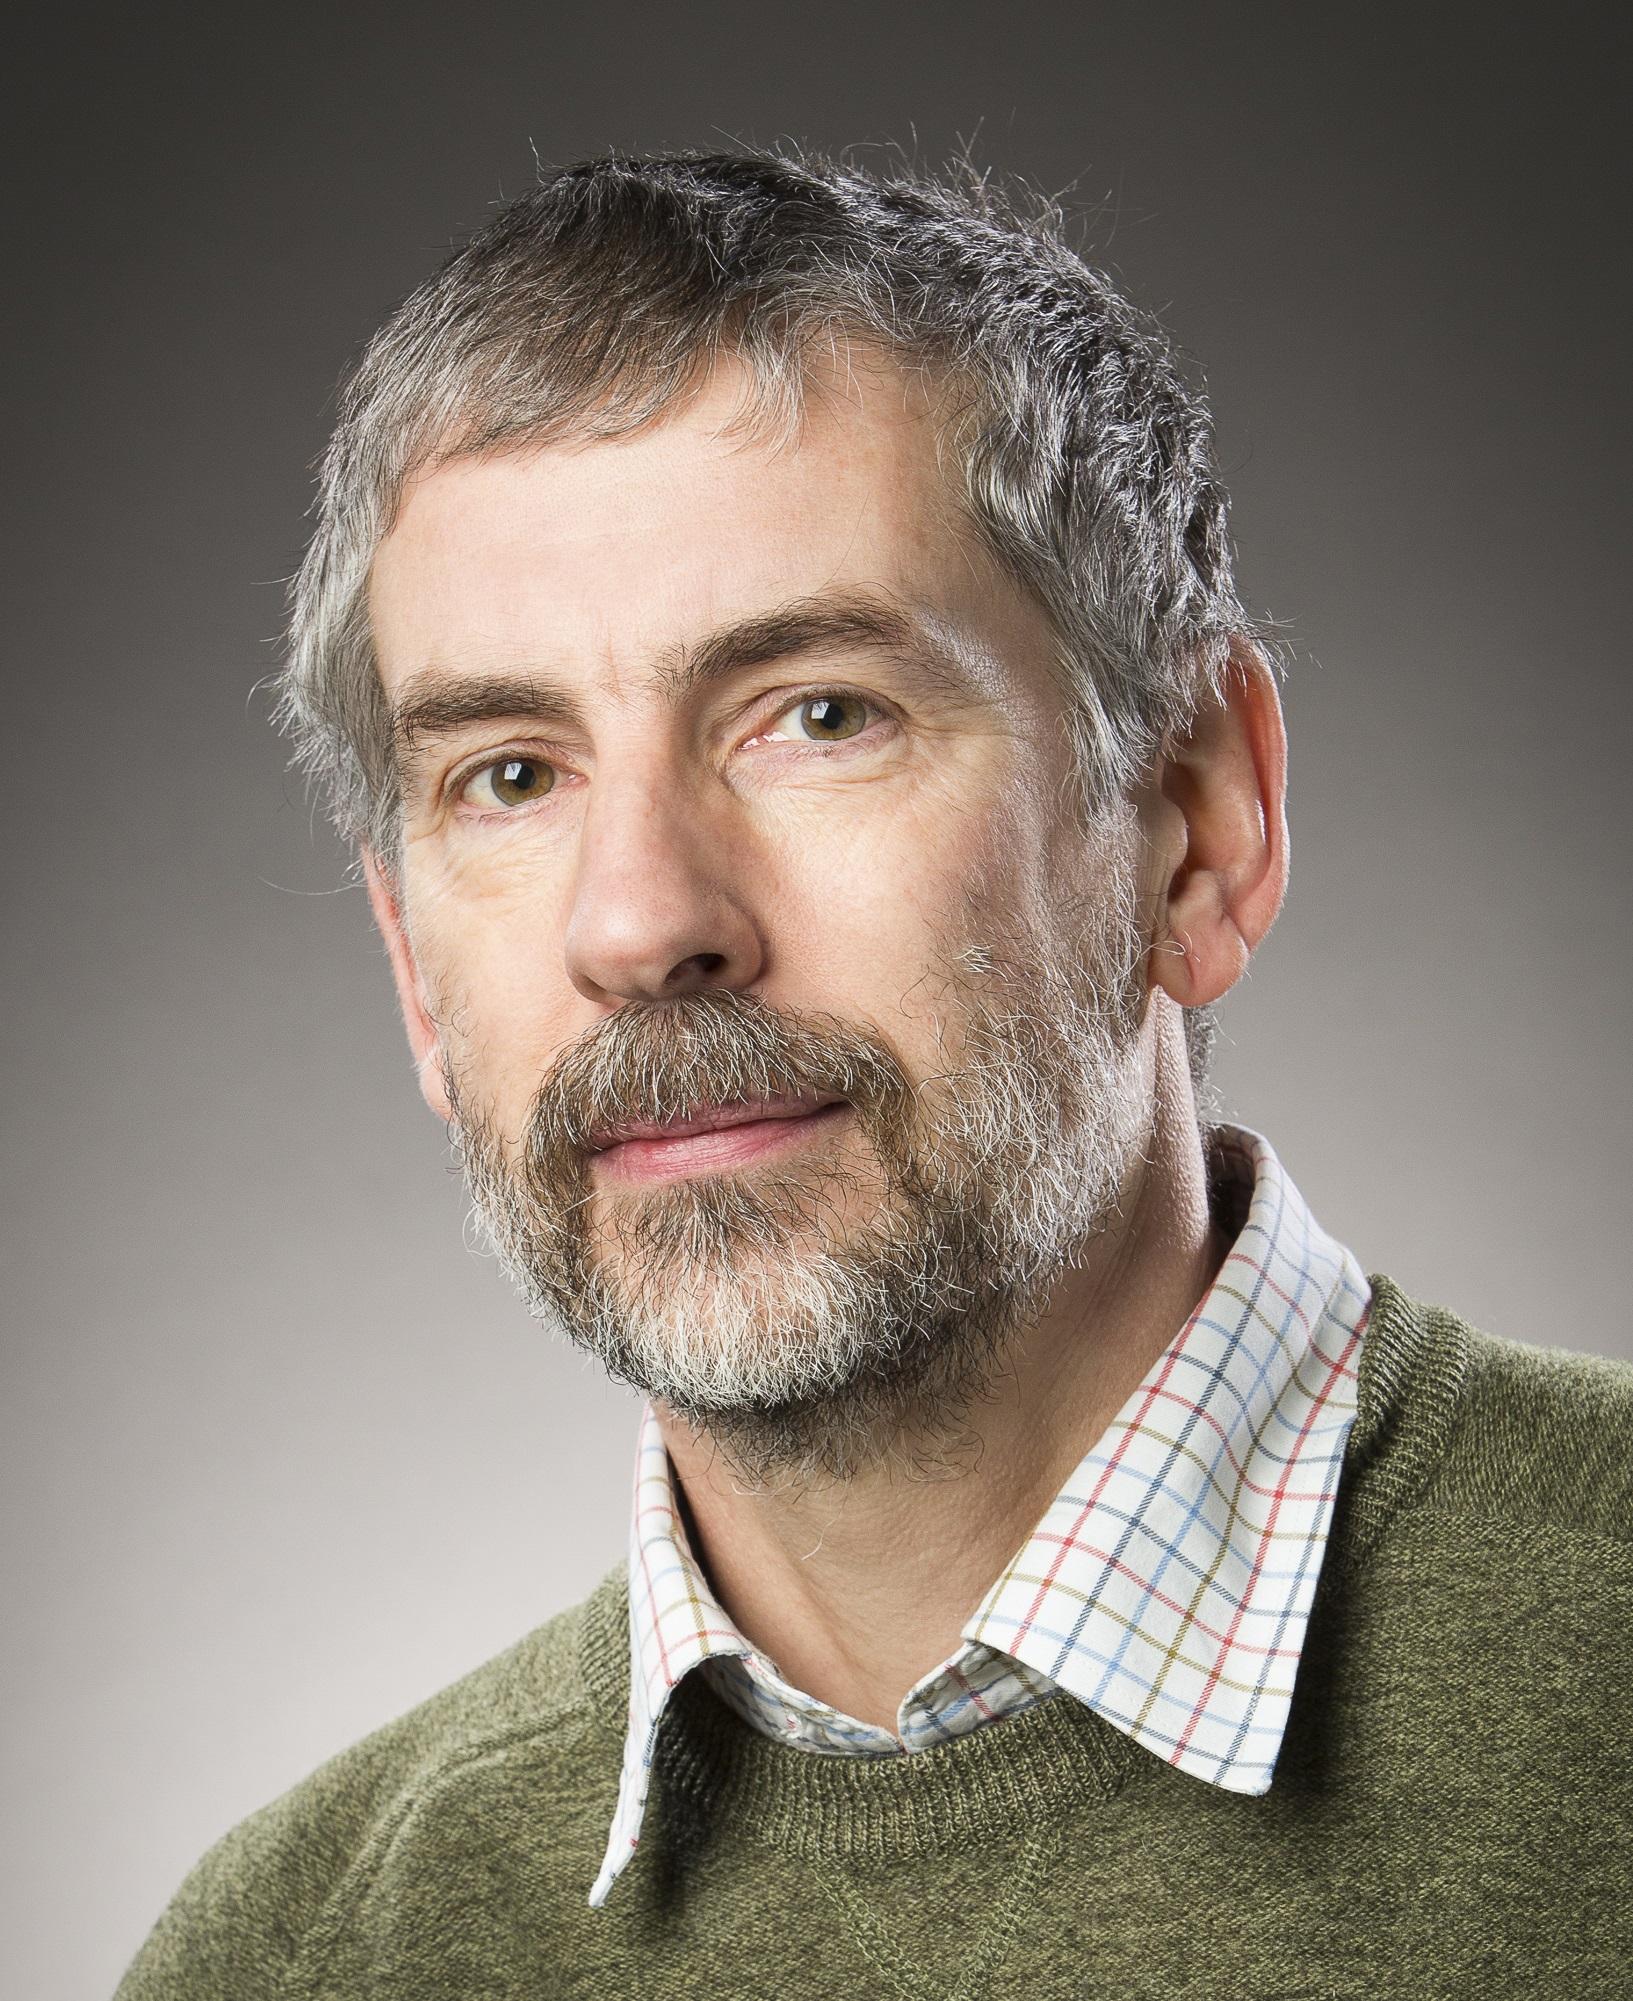 Paul McCombie, admissions tutor for Civil Engineering, University of Bath